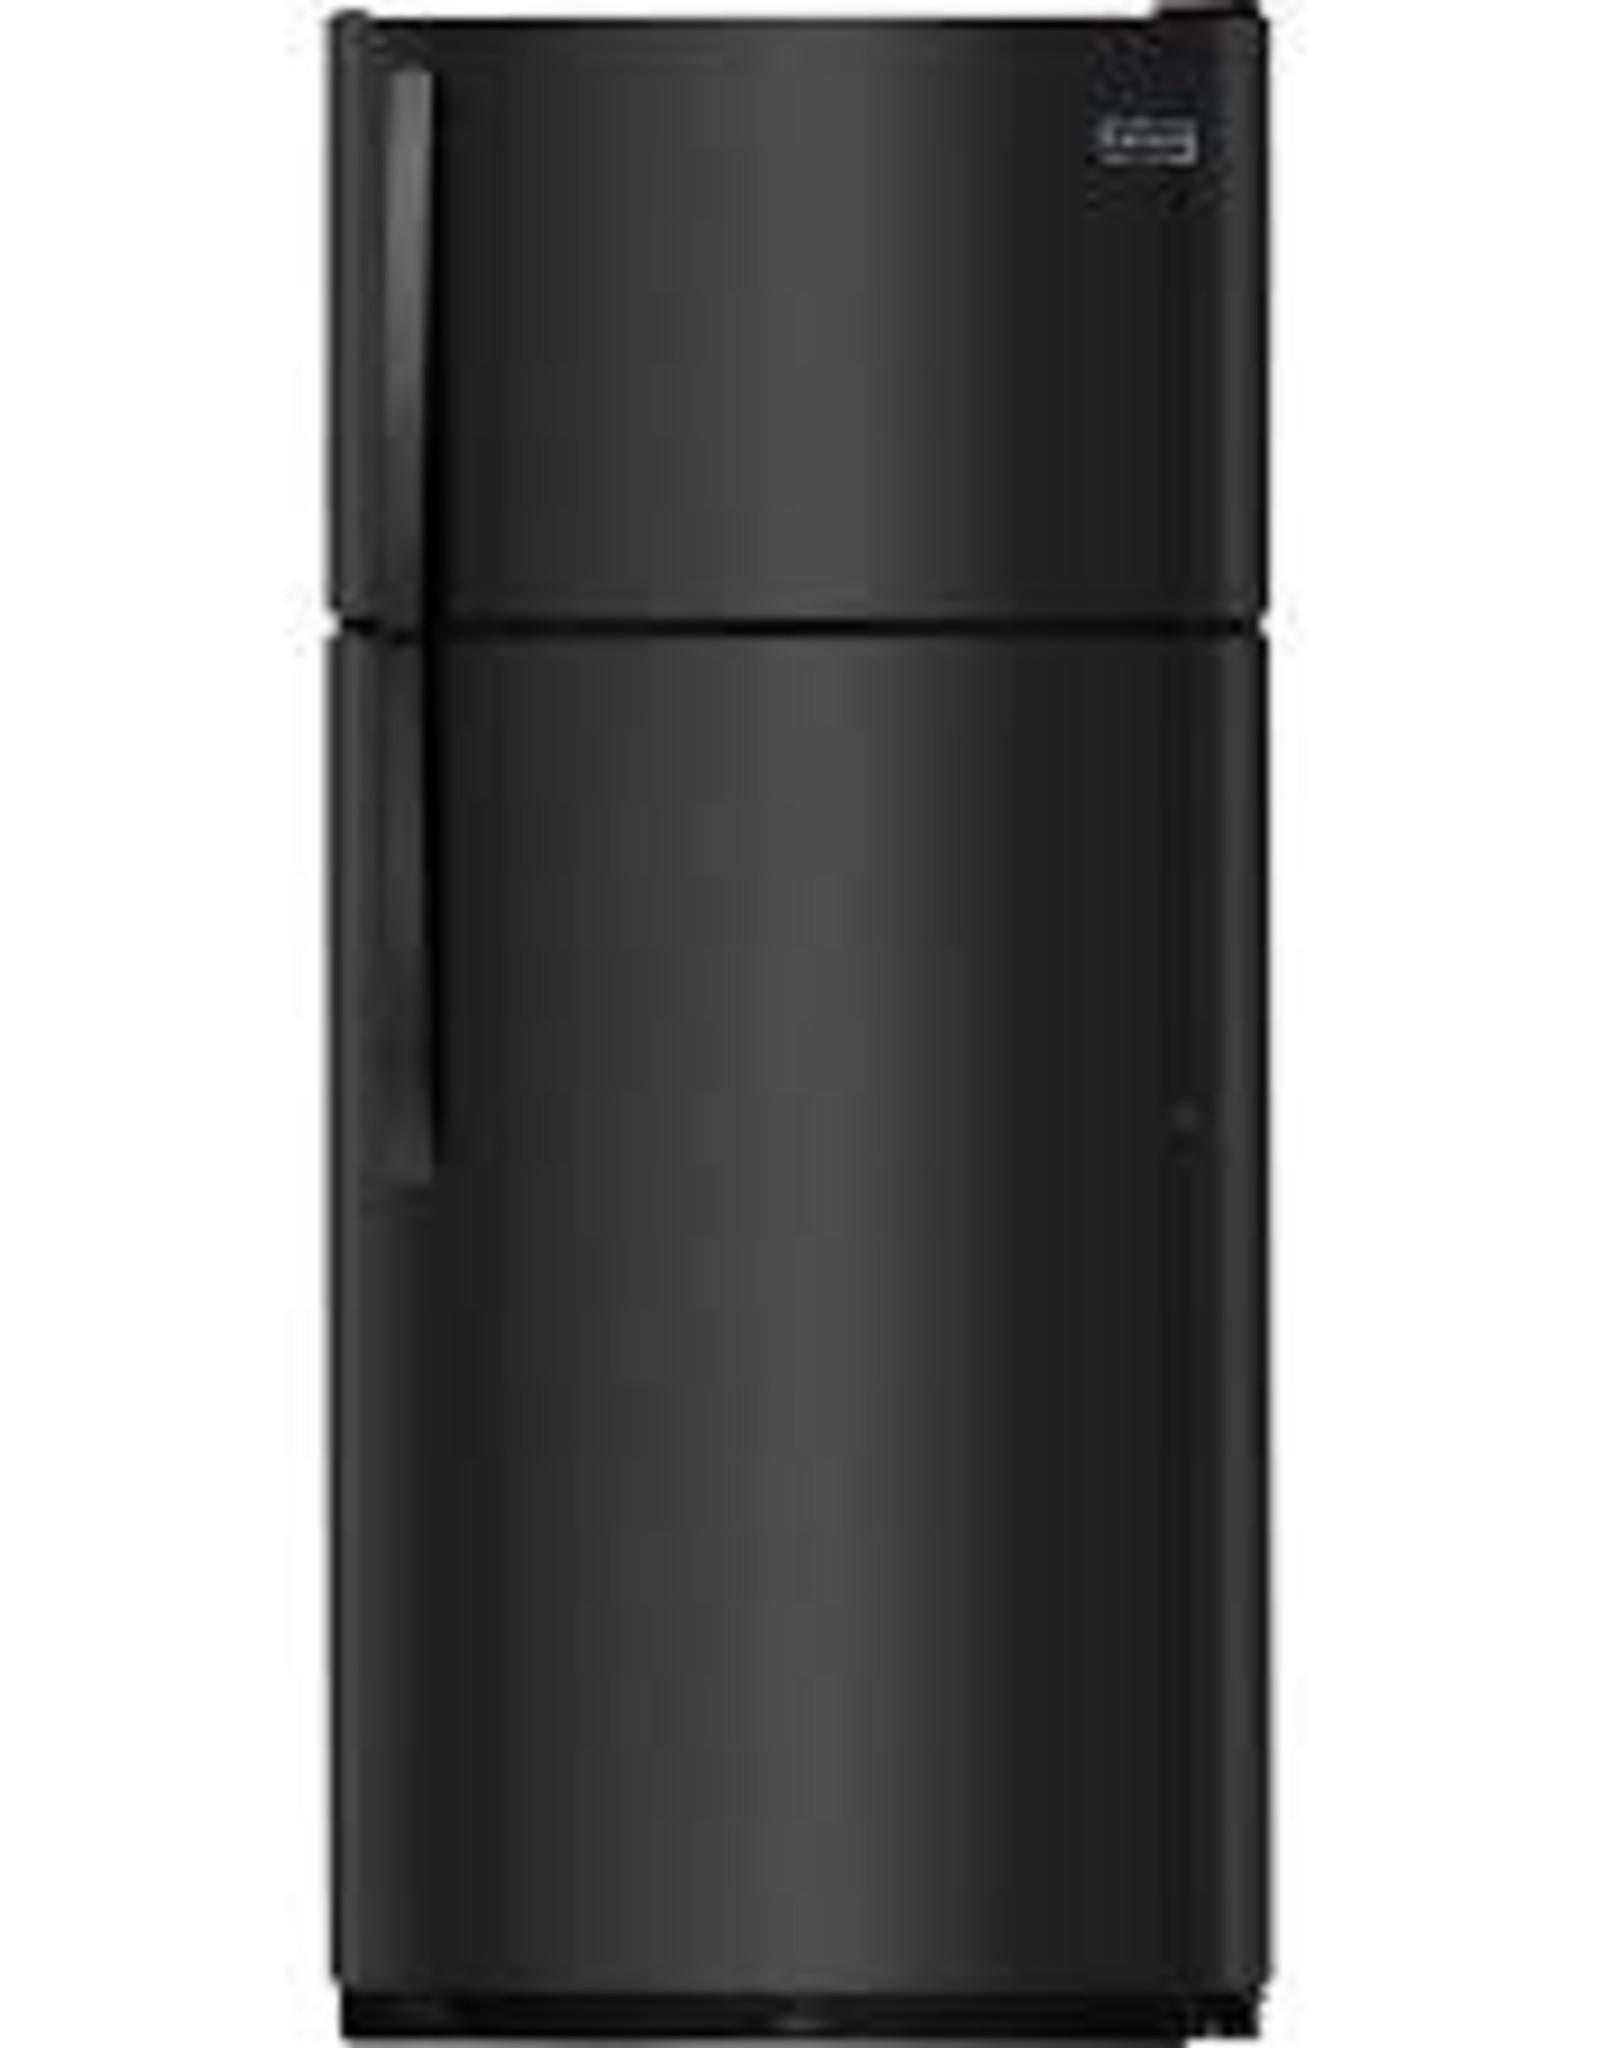 CLS 18CFT Crosley Refrigerator Black